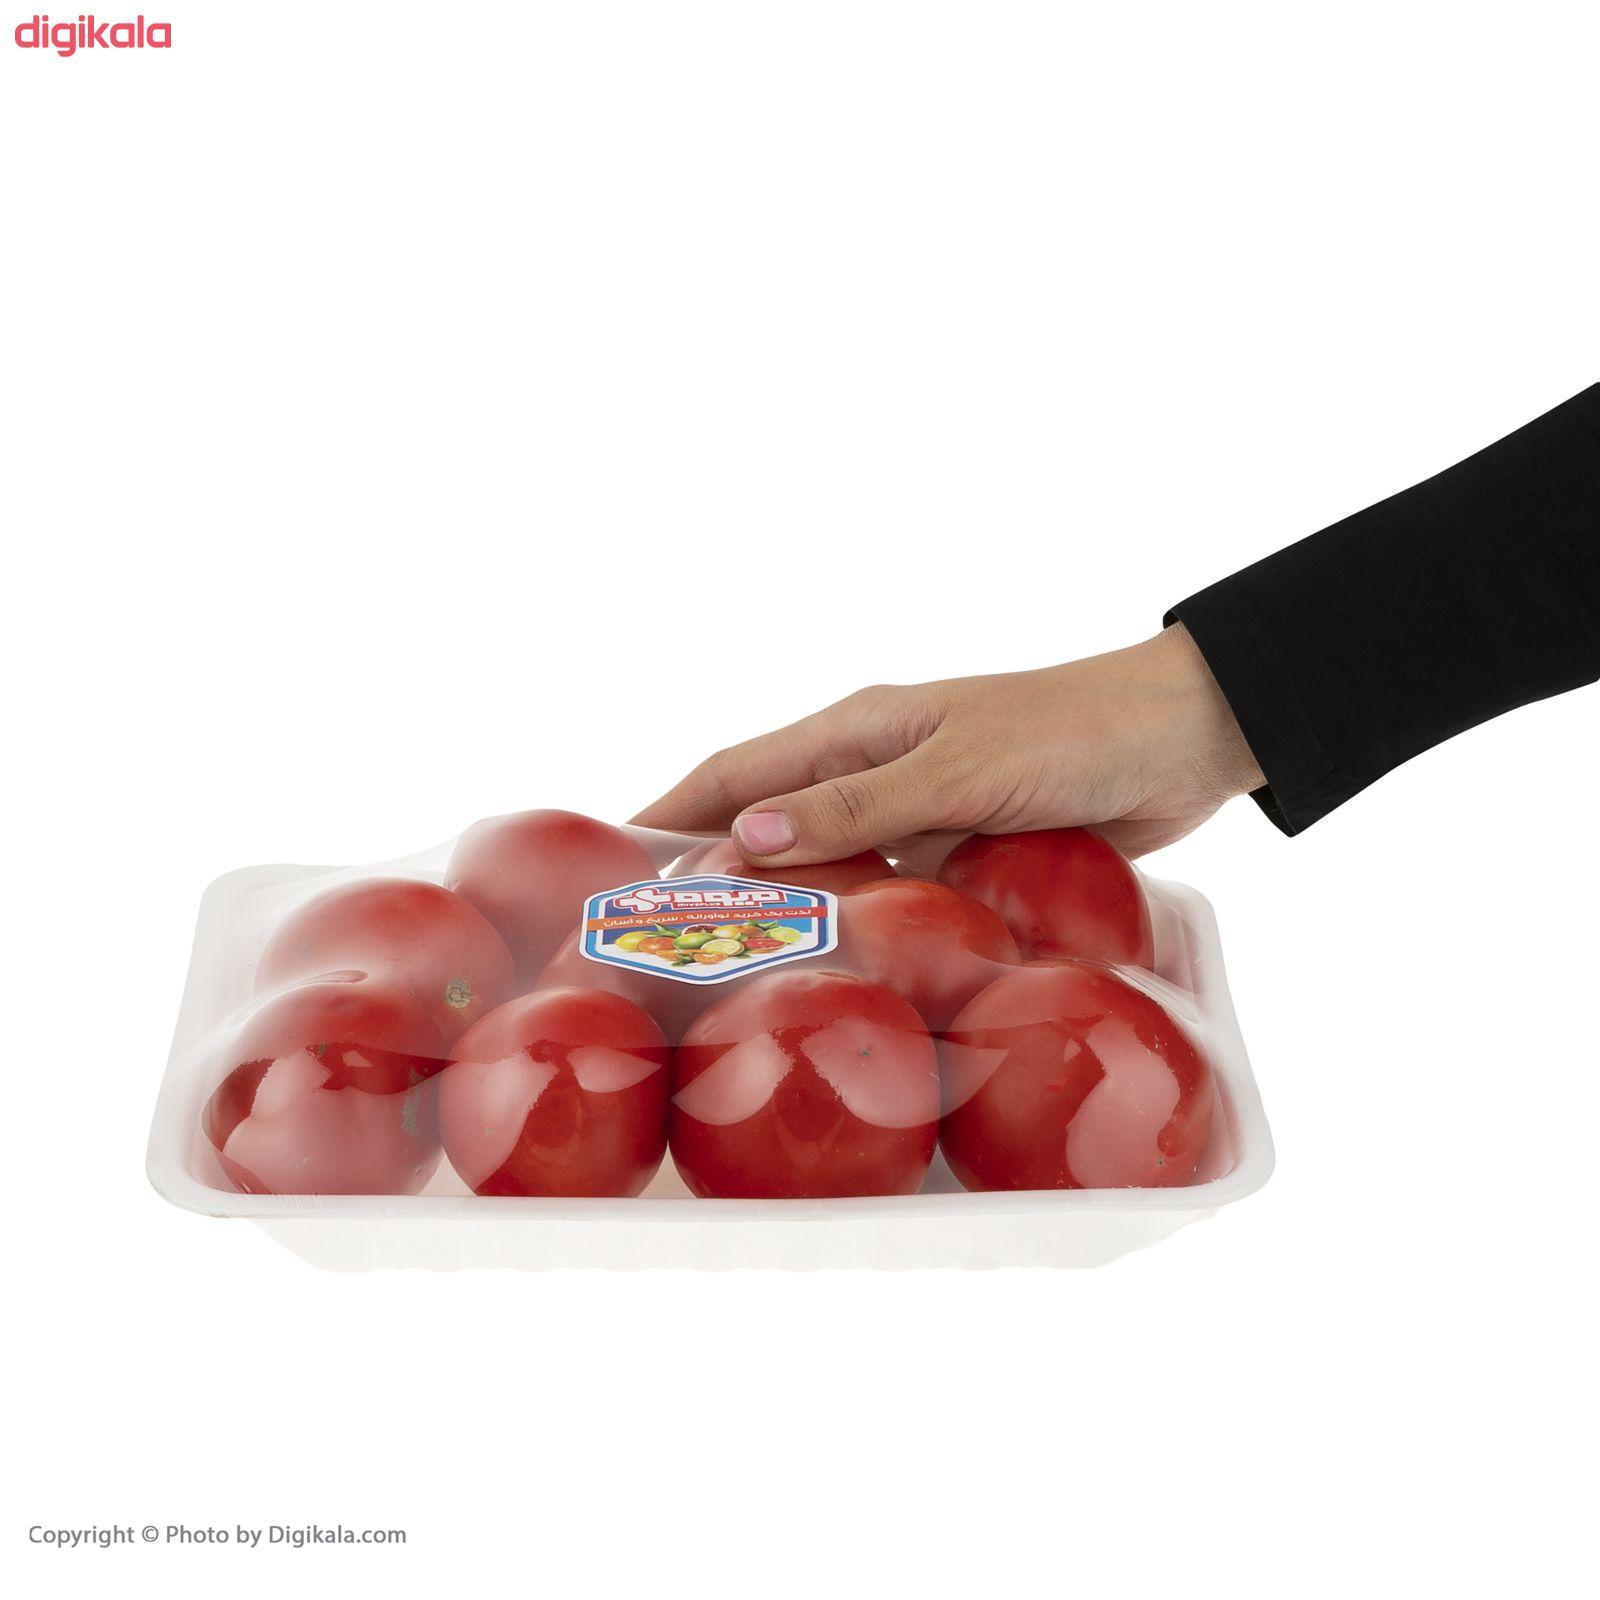 گوجه فرنگی بوته ای میوه پلاس - 1 کیلوگرم main 1 5